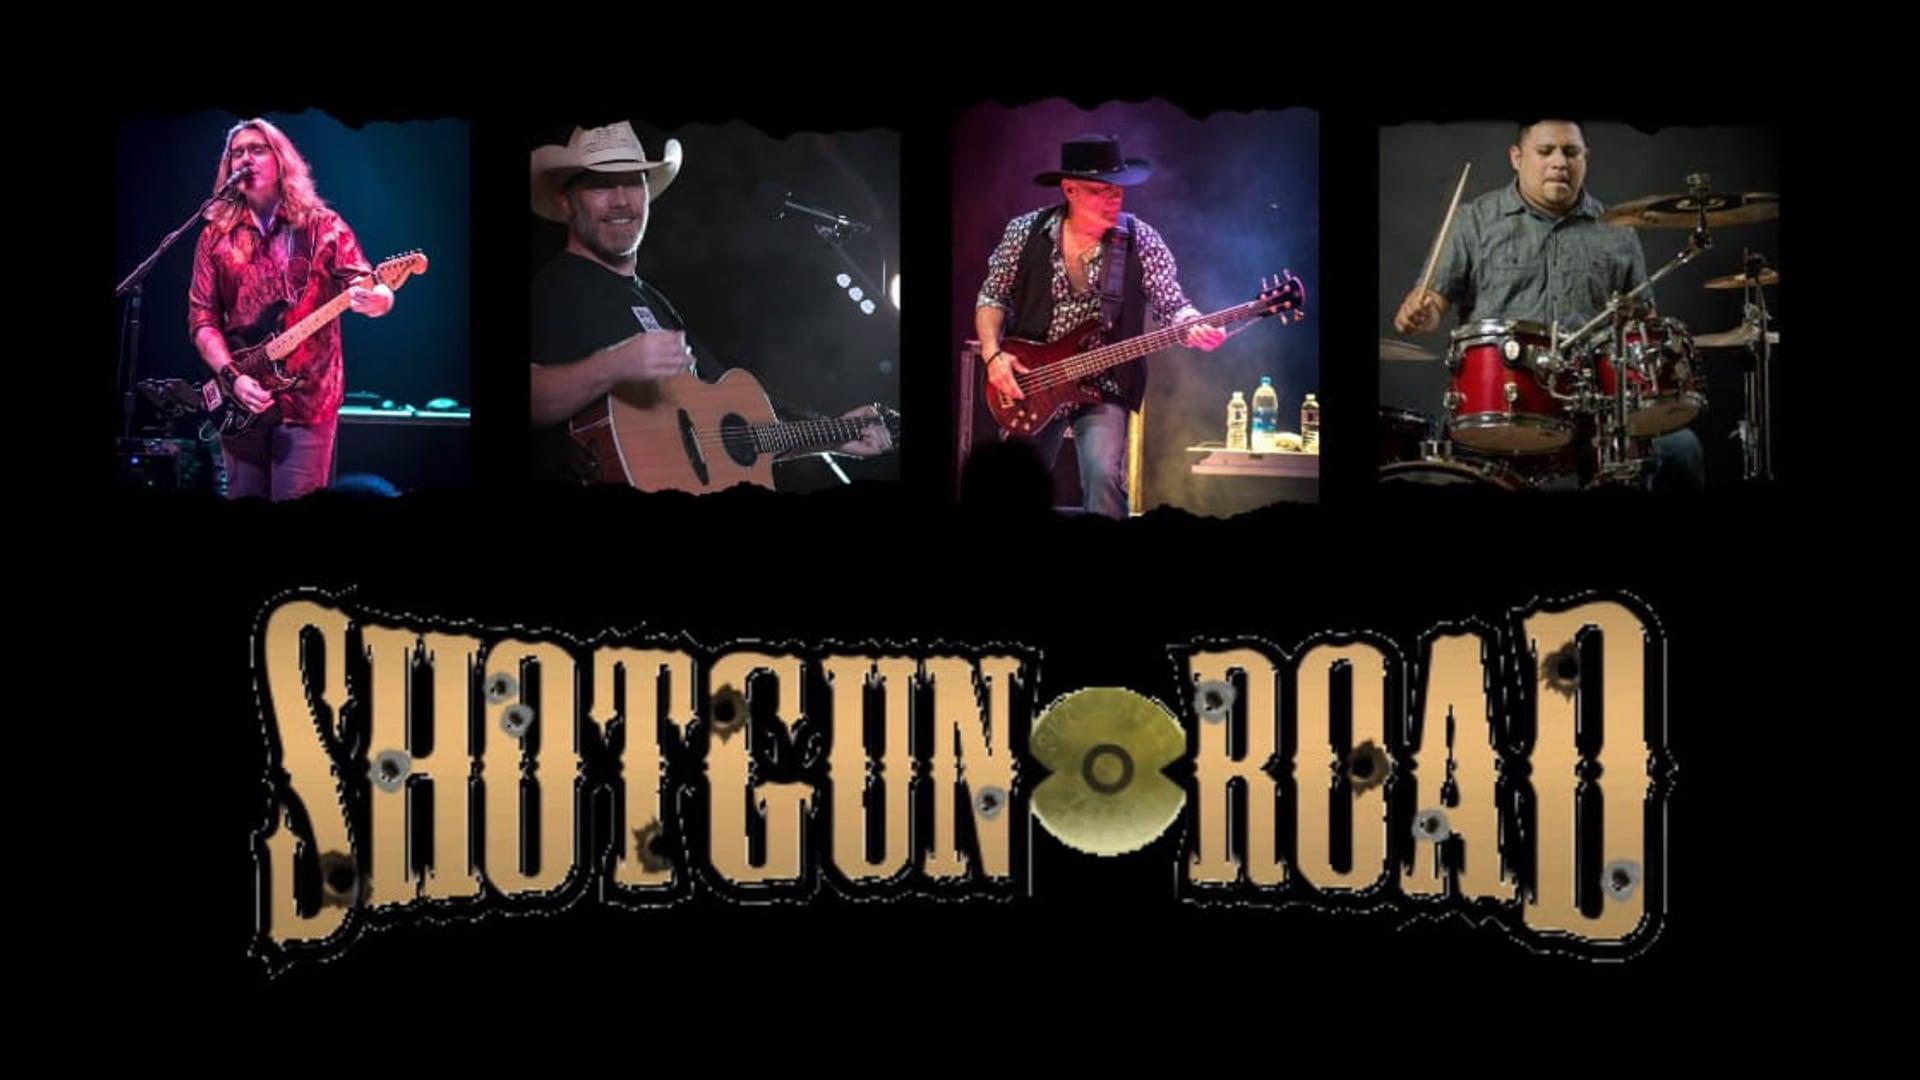 Shotgun Road Medley 1